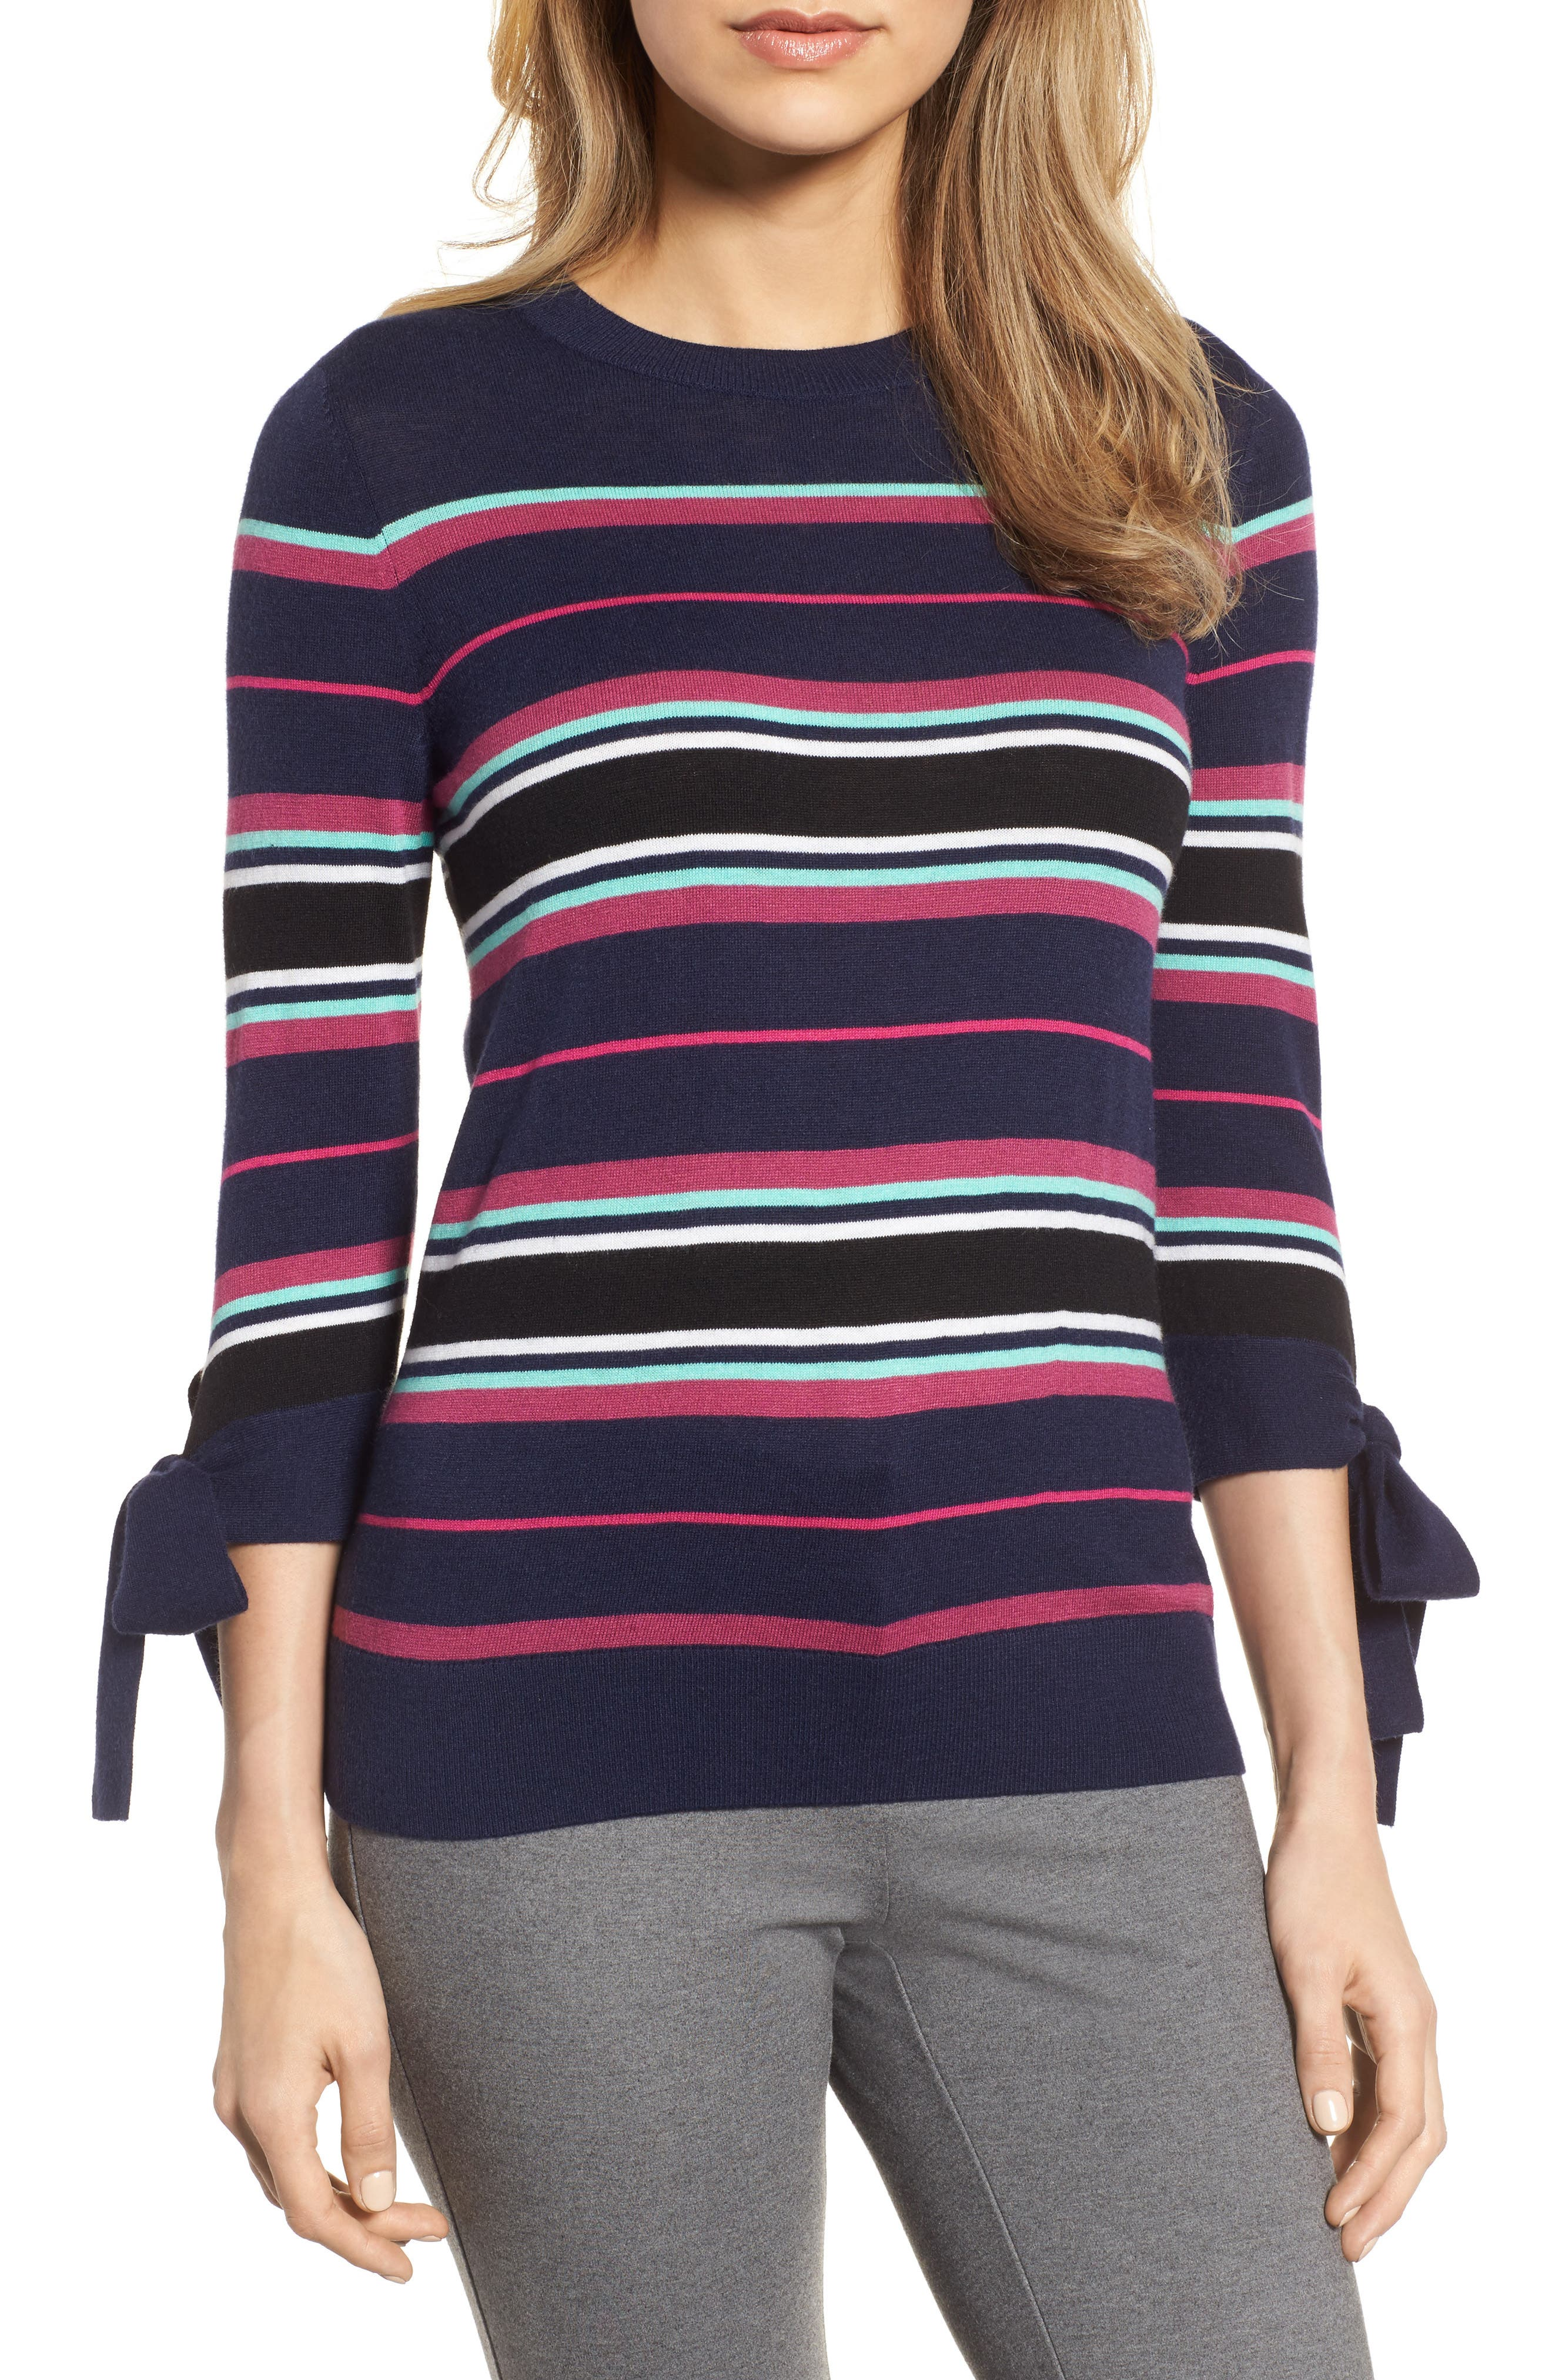 Tie Sleeve Crewneck Sweater,                         Main,                         color, Navy/ Pink Multi Stripe